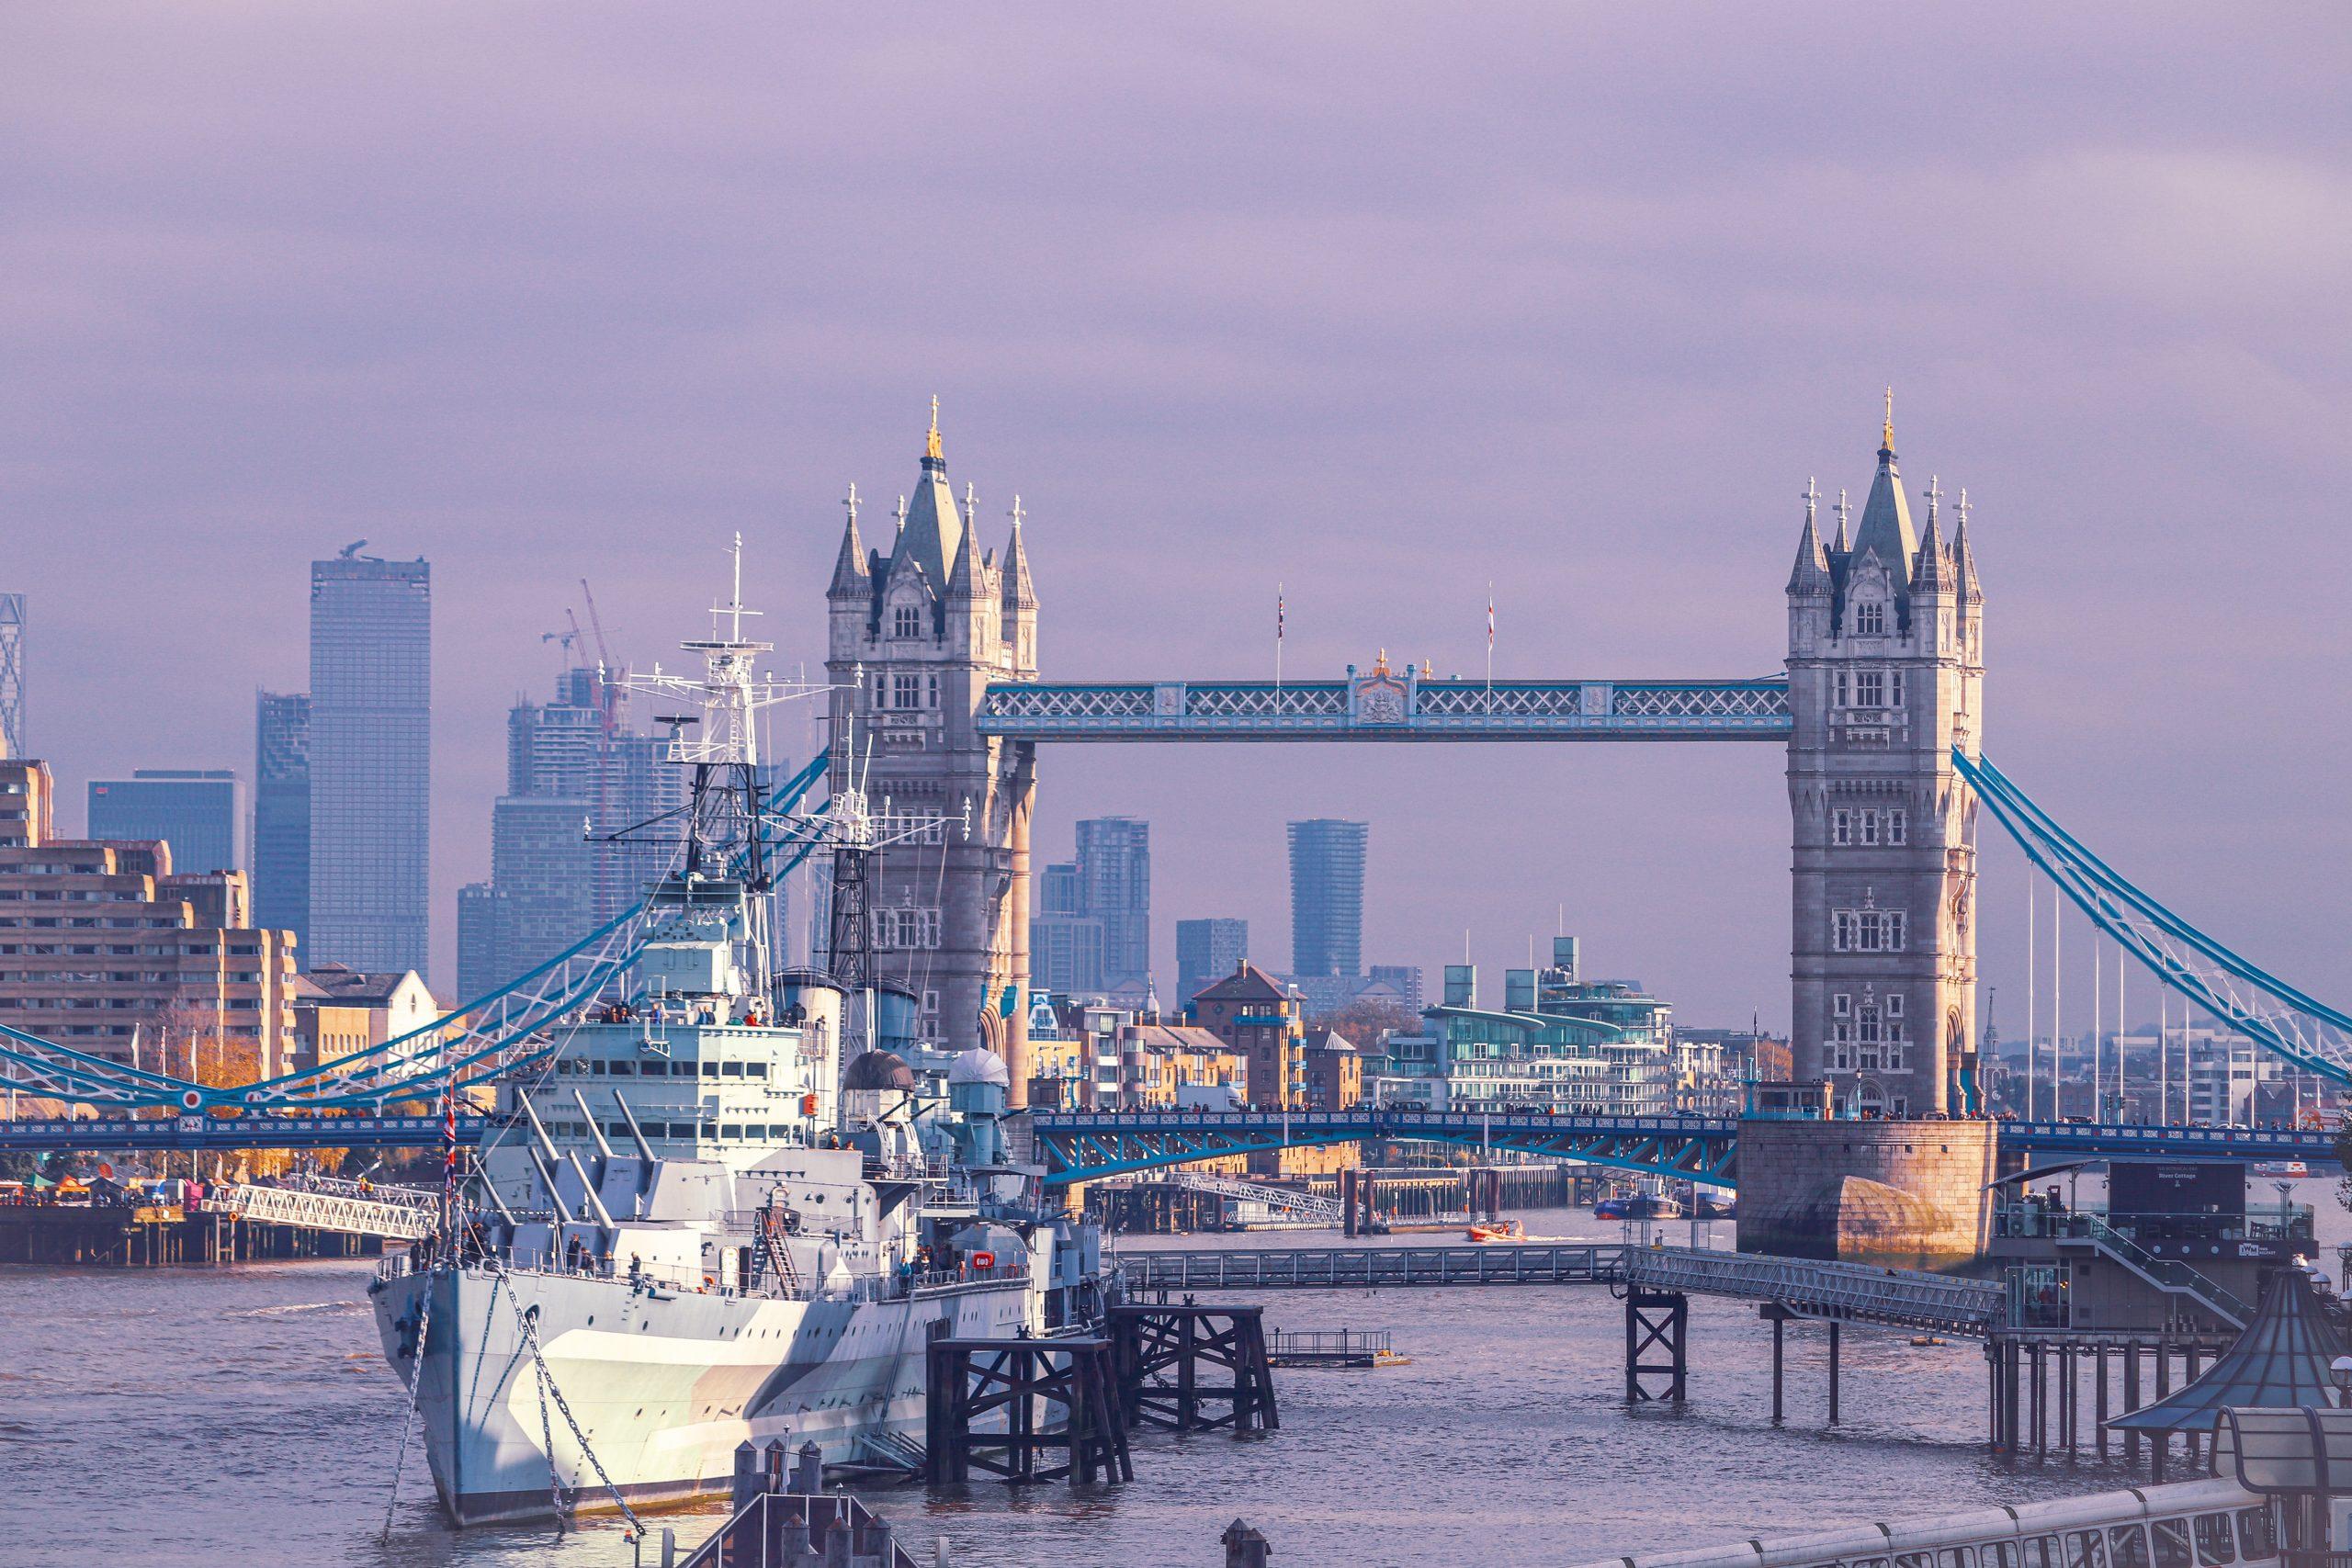 Tower Bridge in the United Kingdom